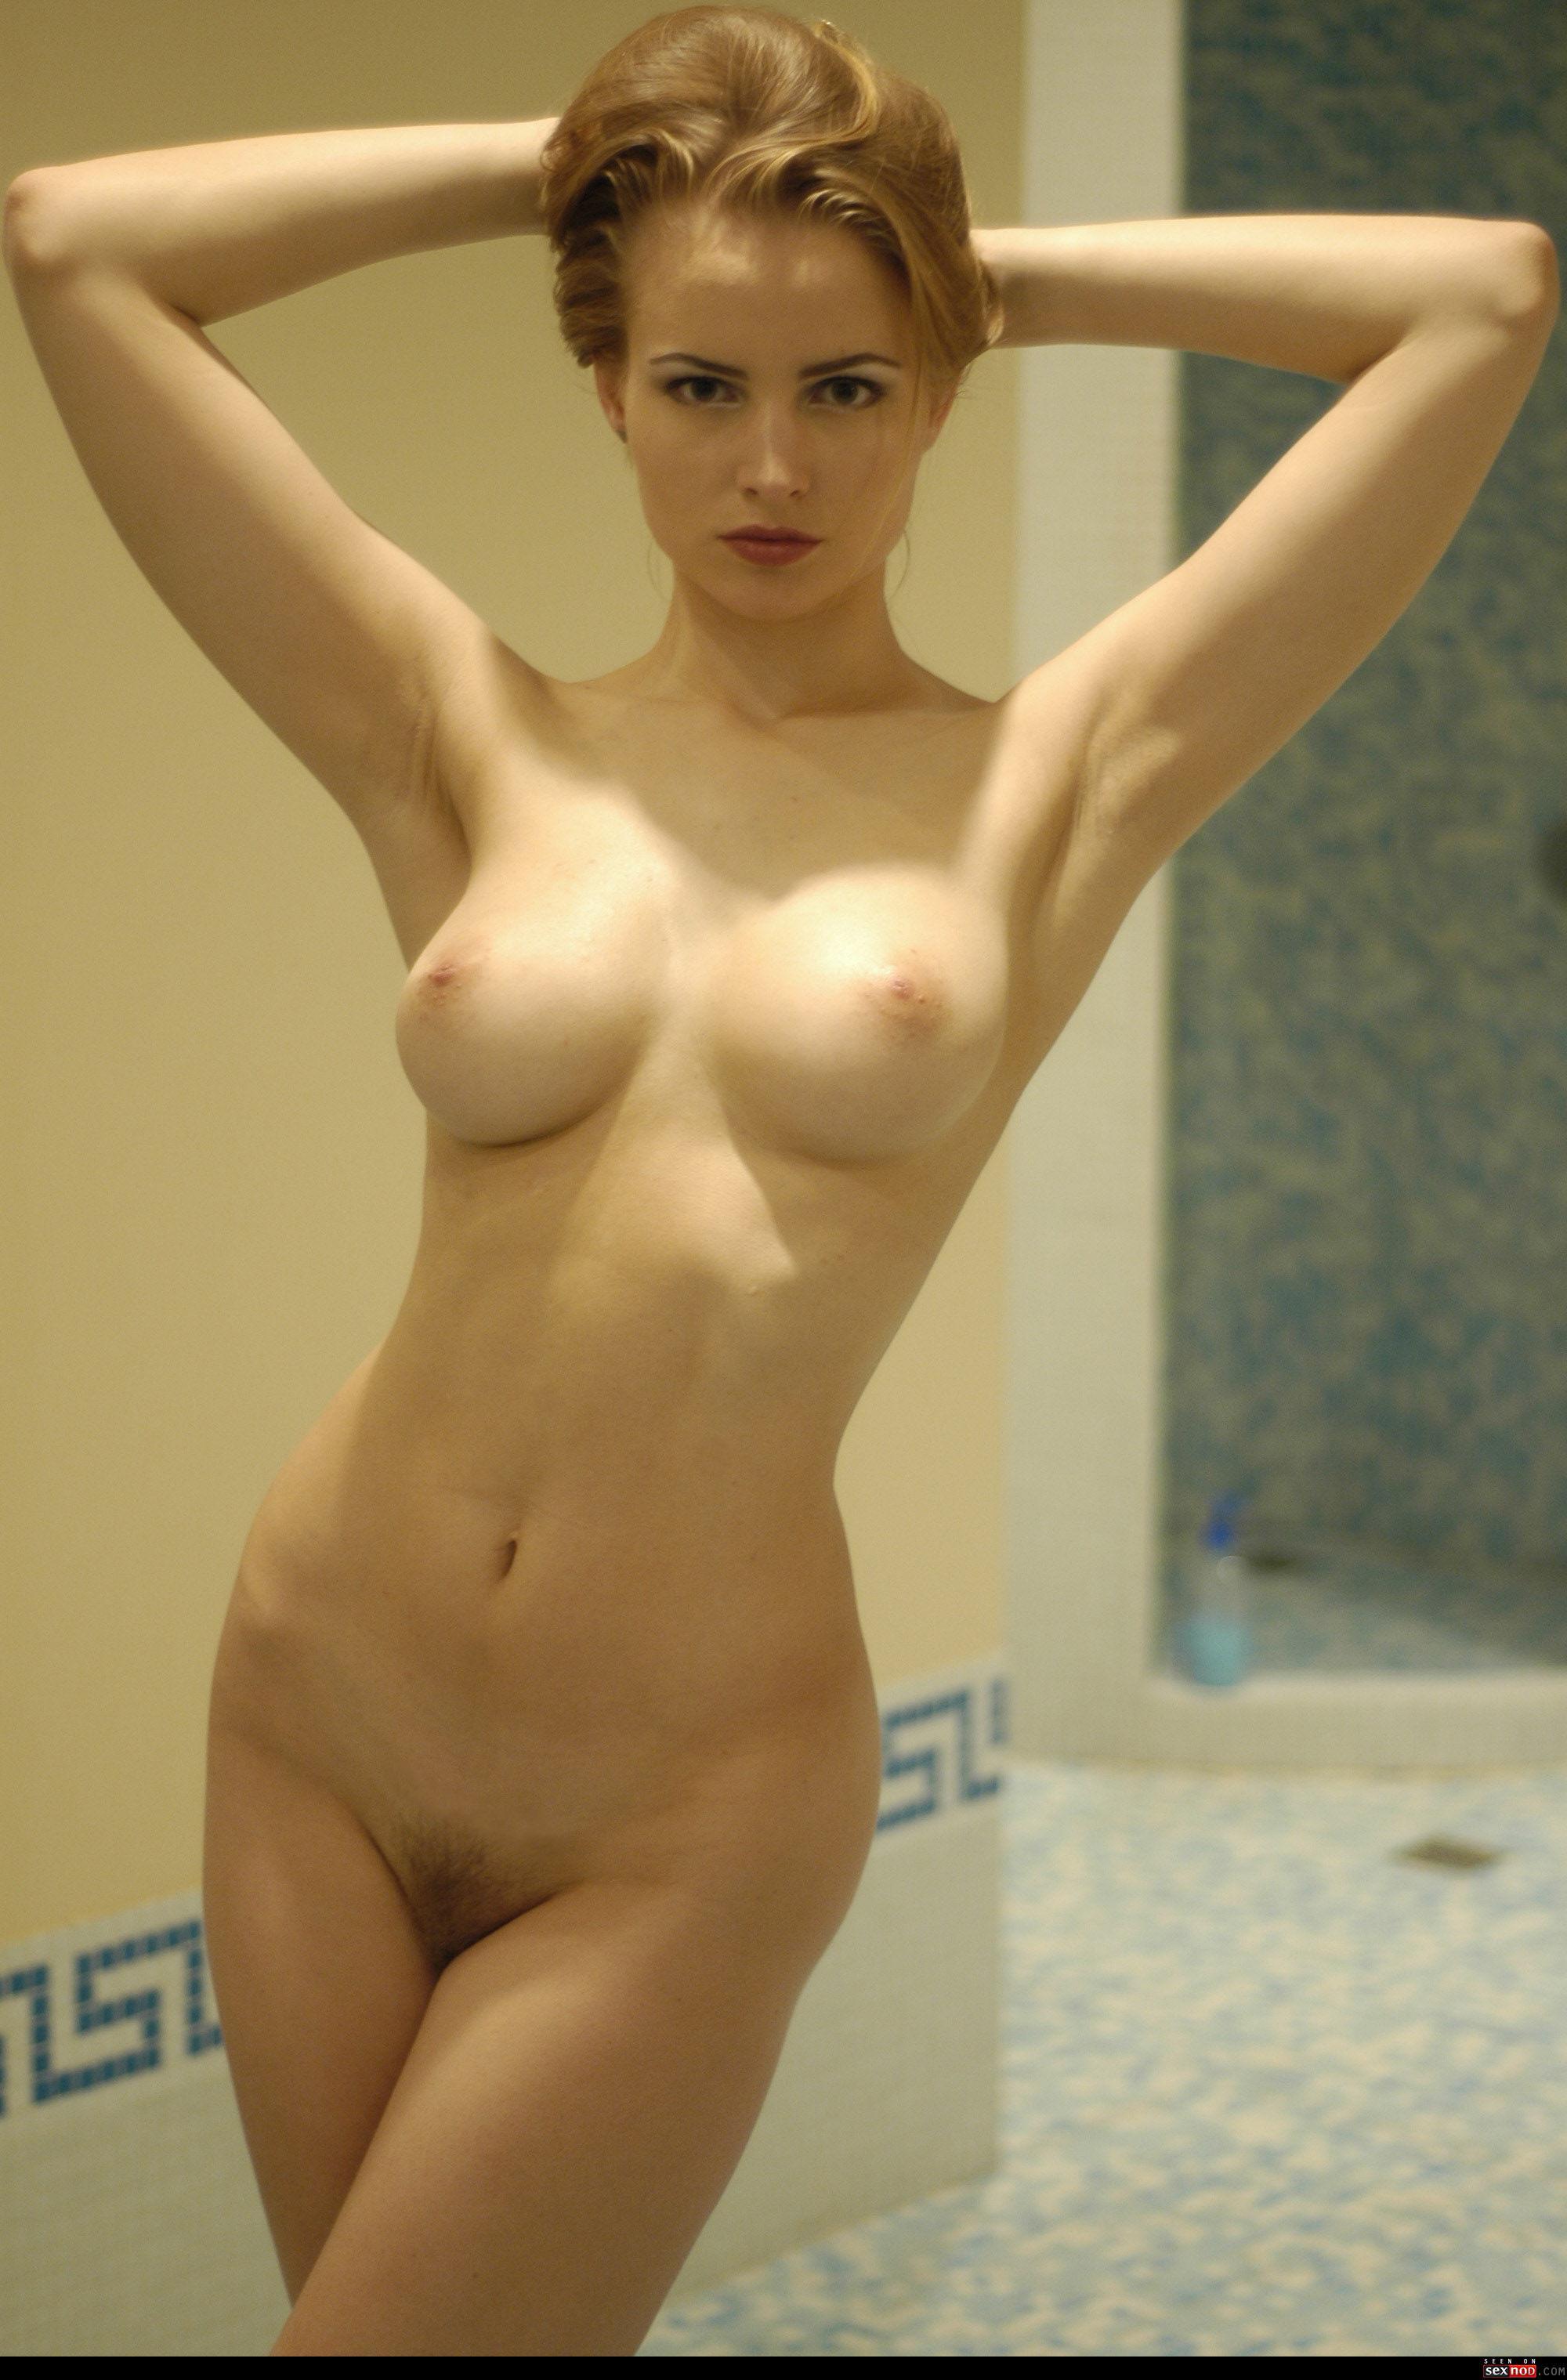 britt robertson nude